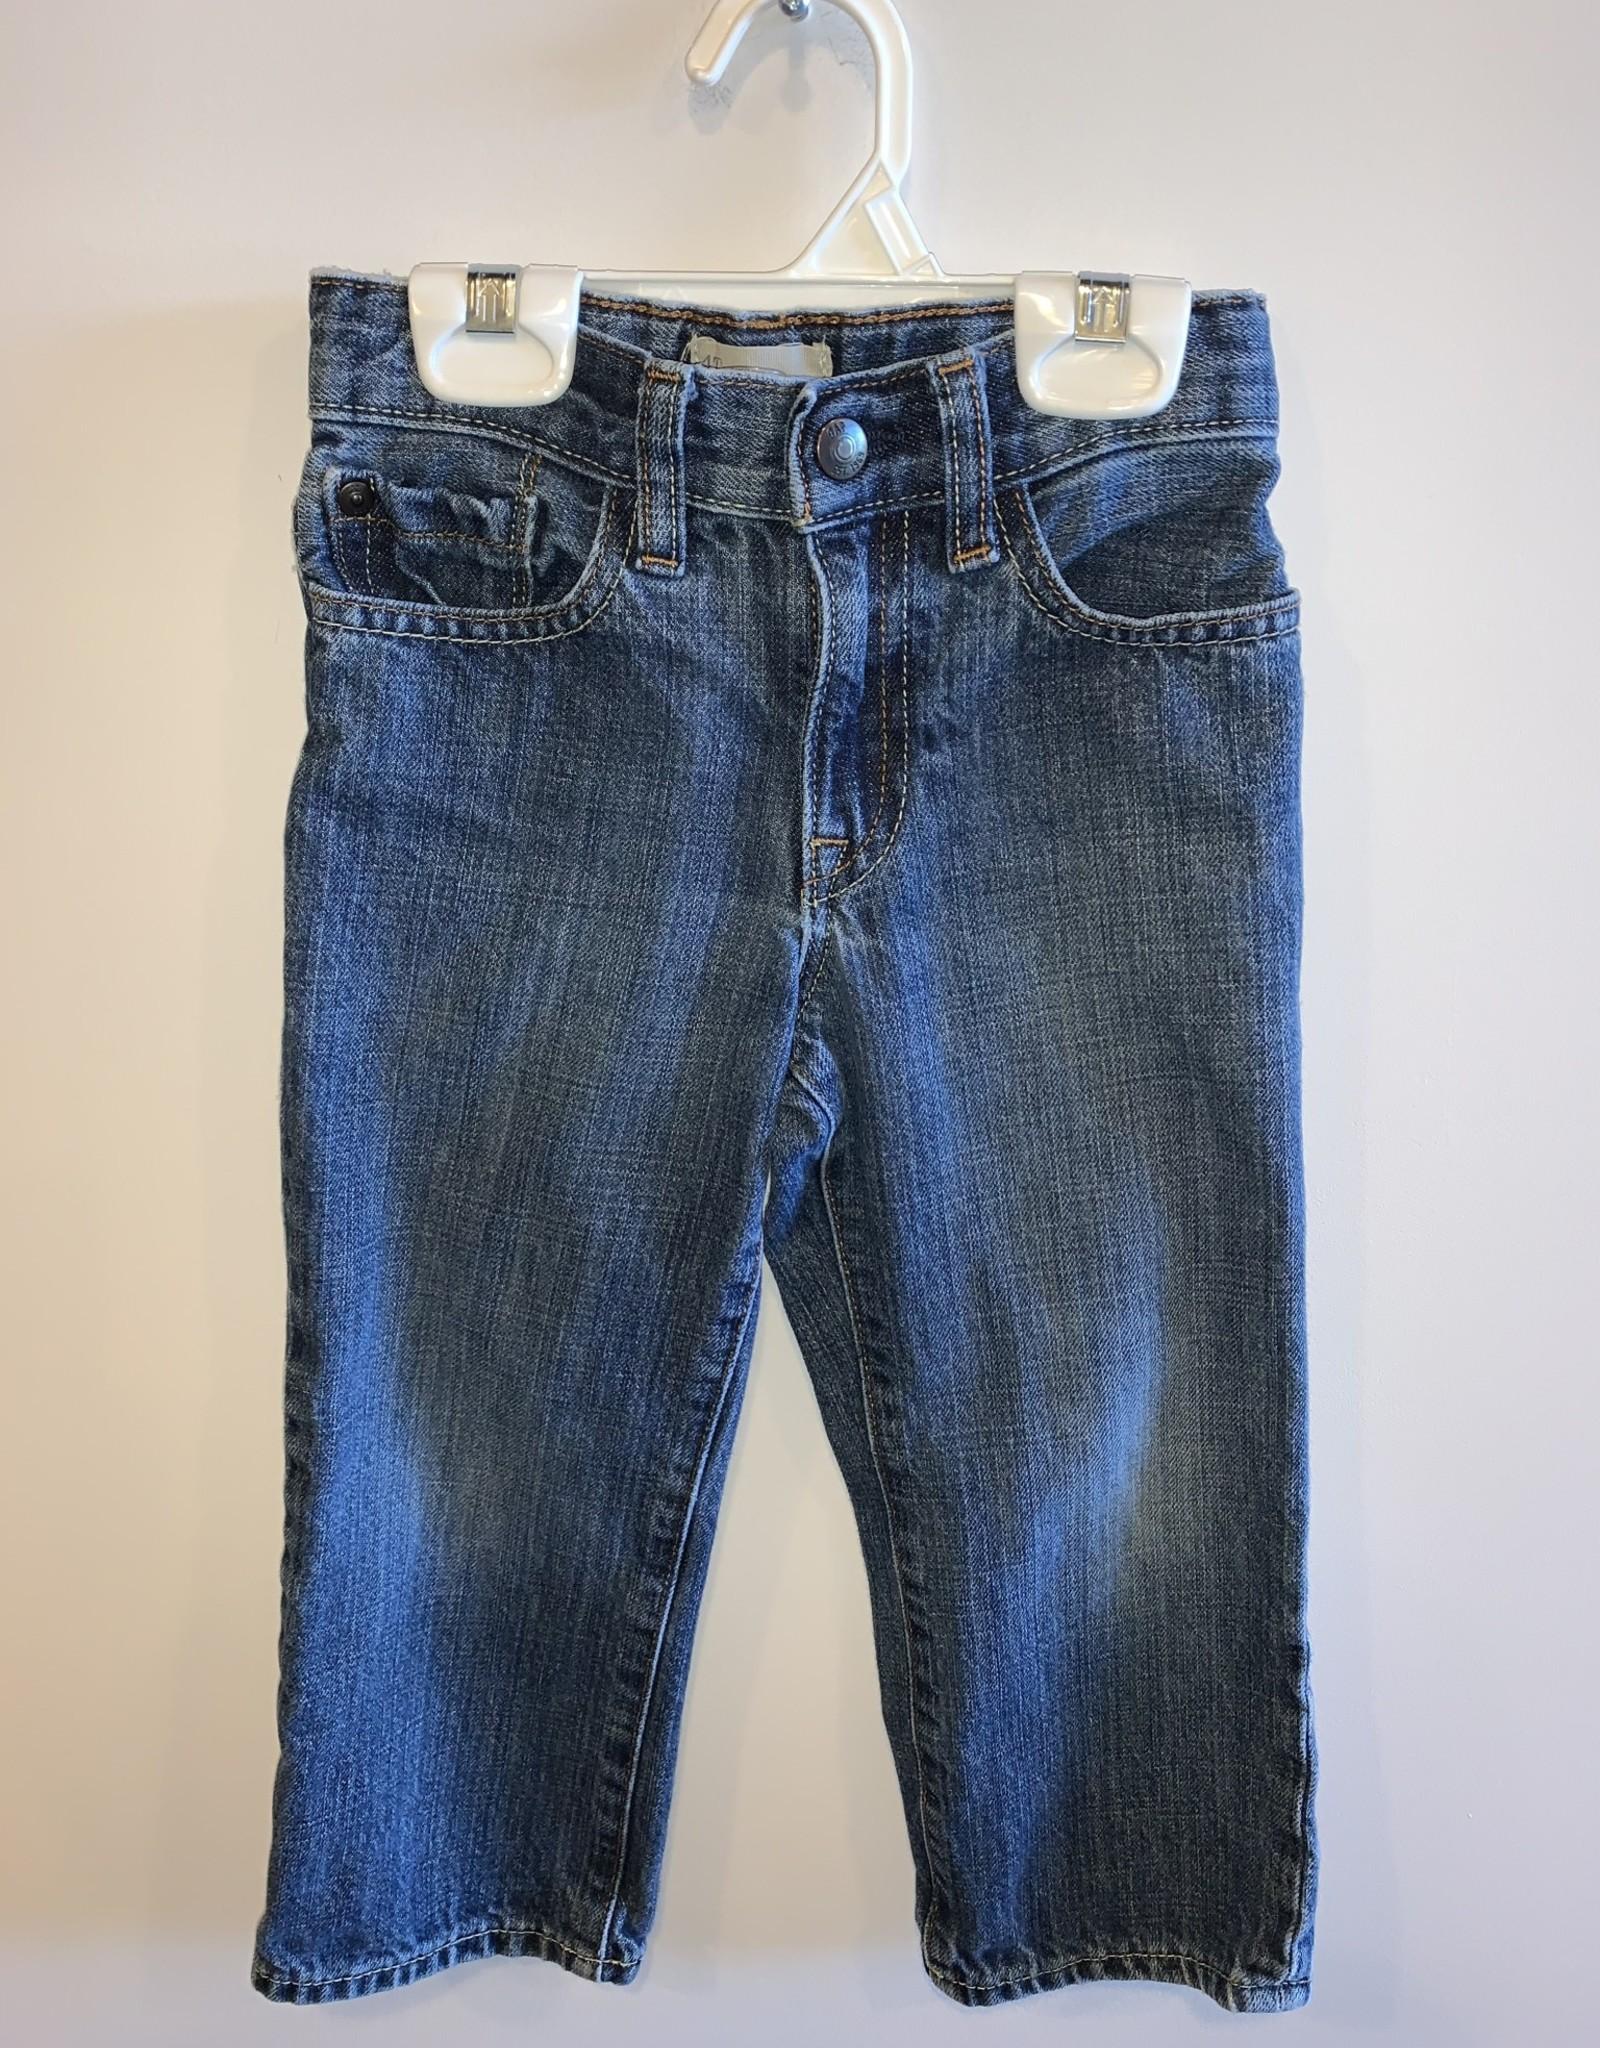 Gap Boys/4T/Gap/Jeans